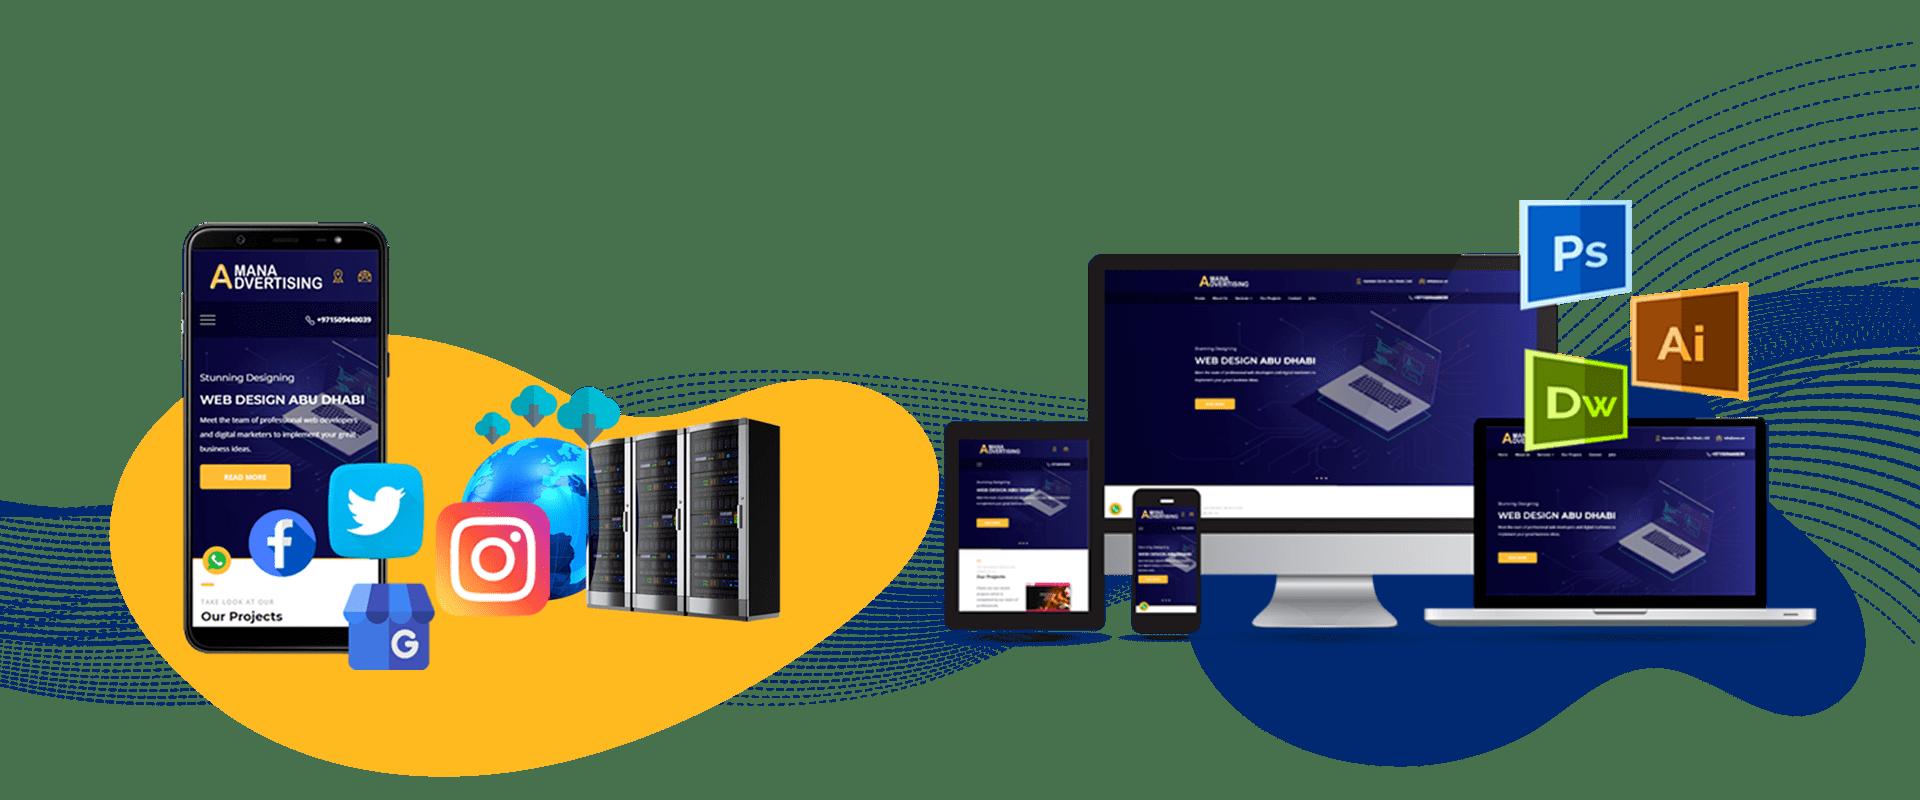 Amana E Commerce Website Design Digital Marketing Mobile Application Development Company